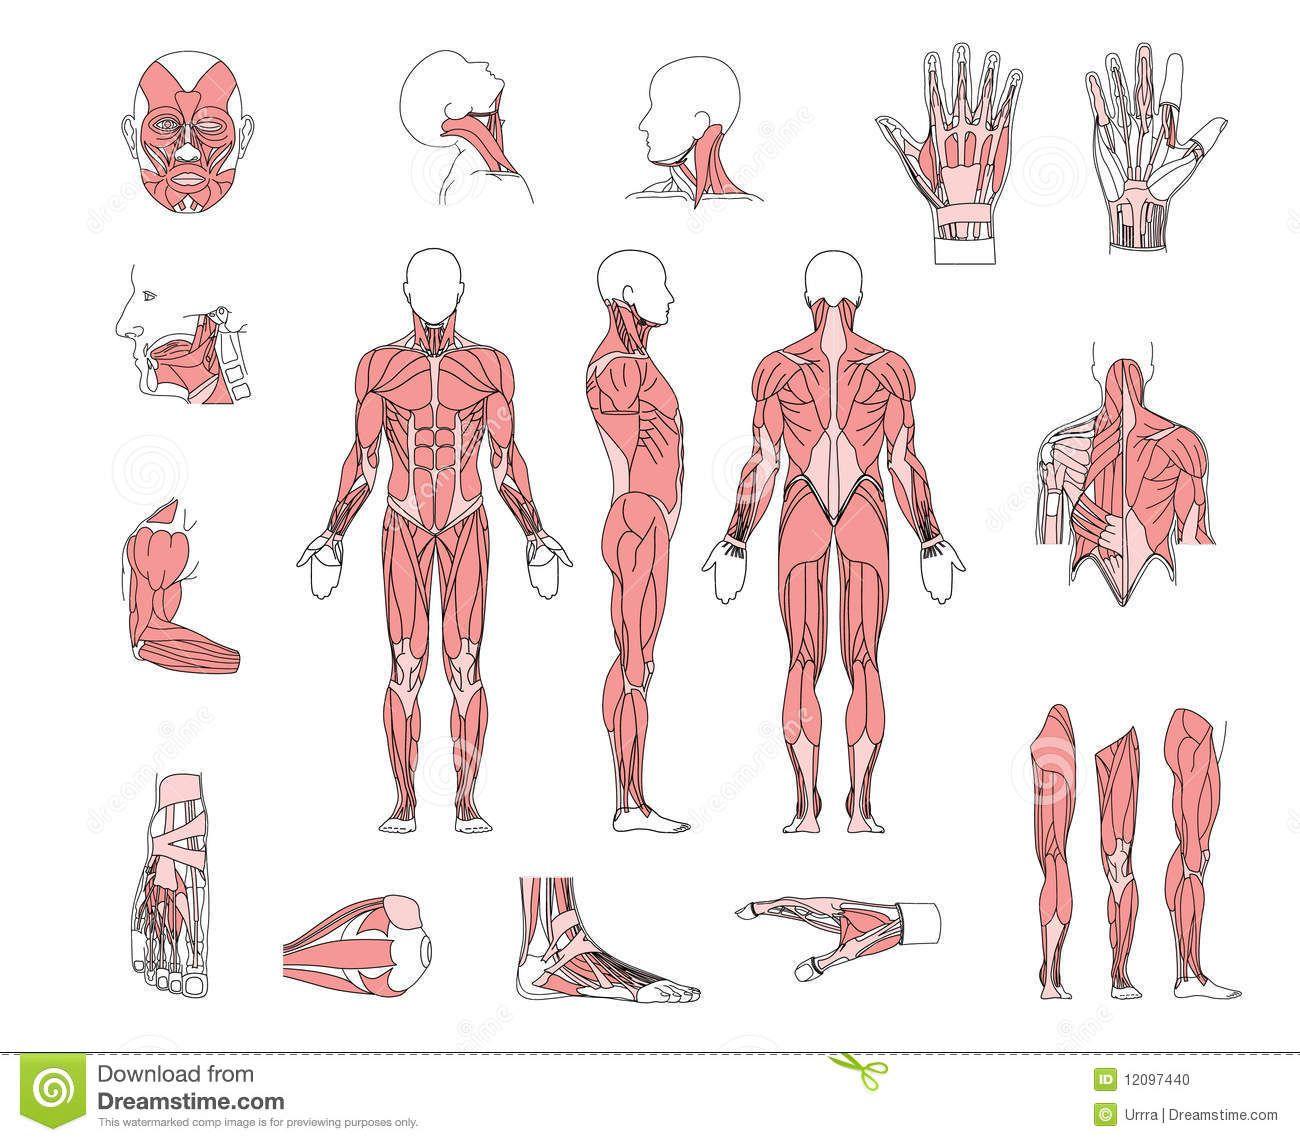 Großzügig Siebbeinhöhle Anatomie Fotos - Anatomie Ideen - finotti.info